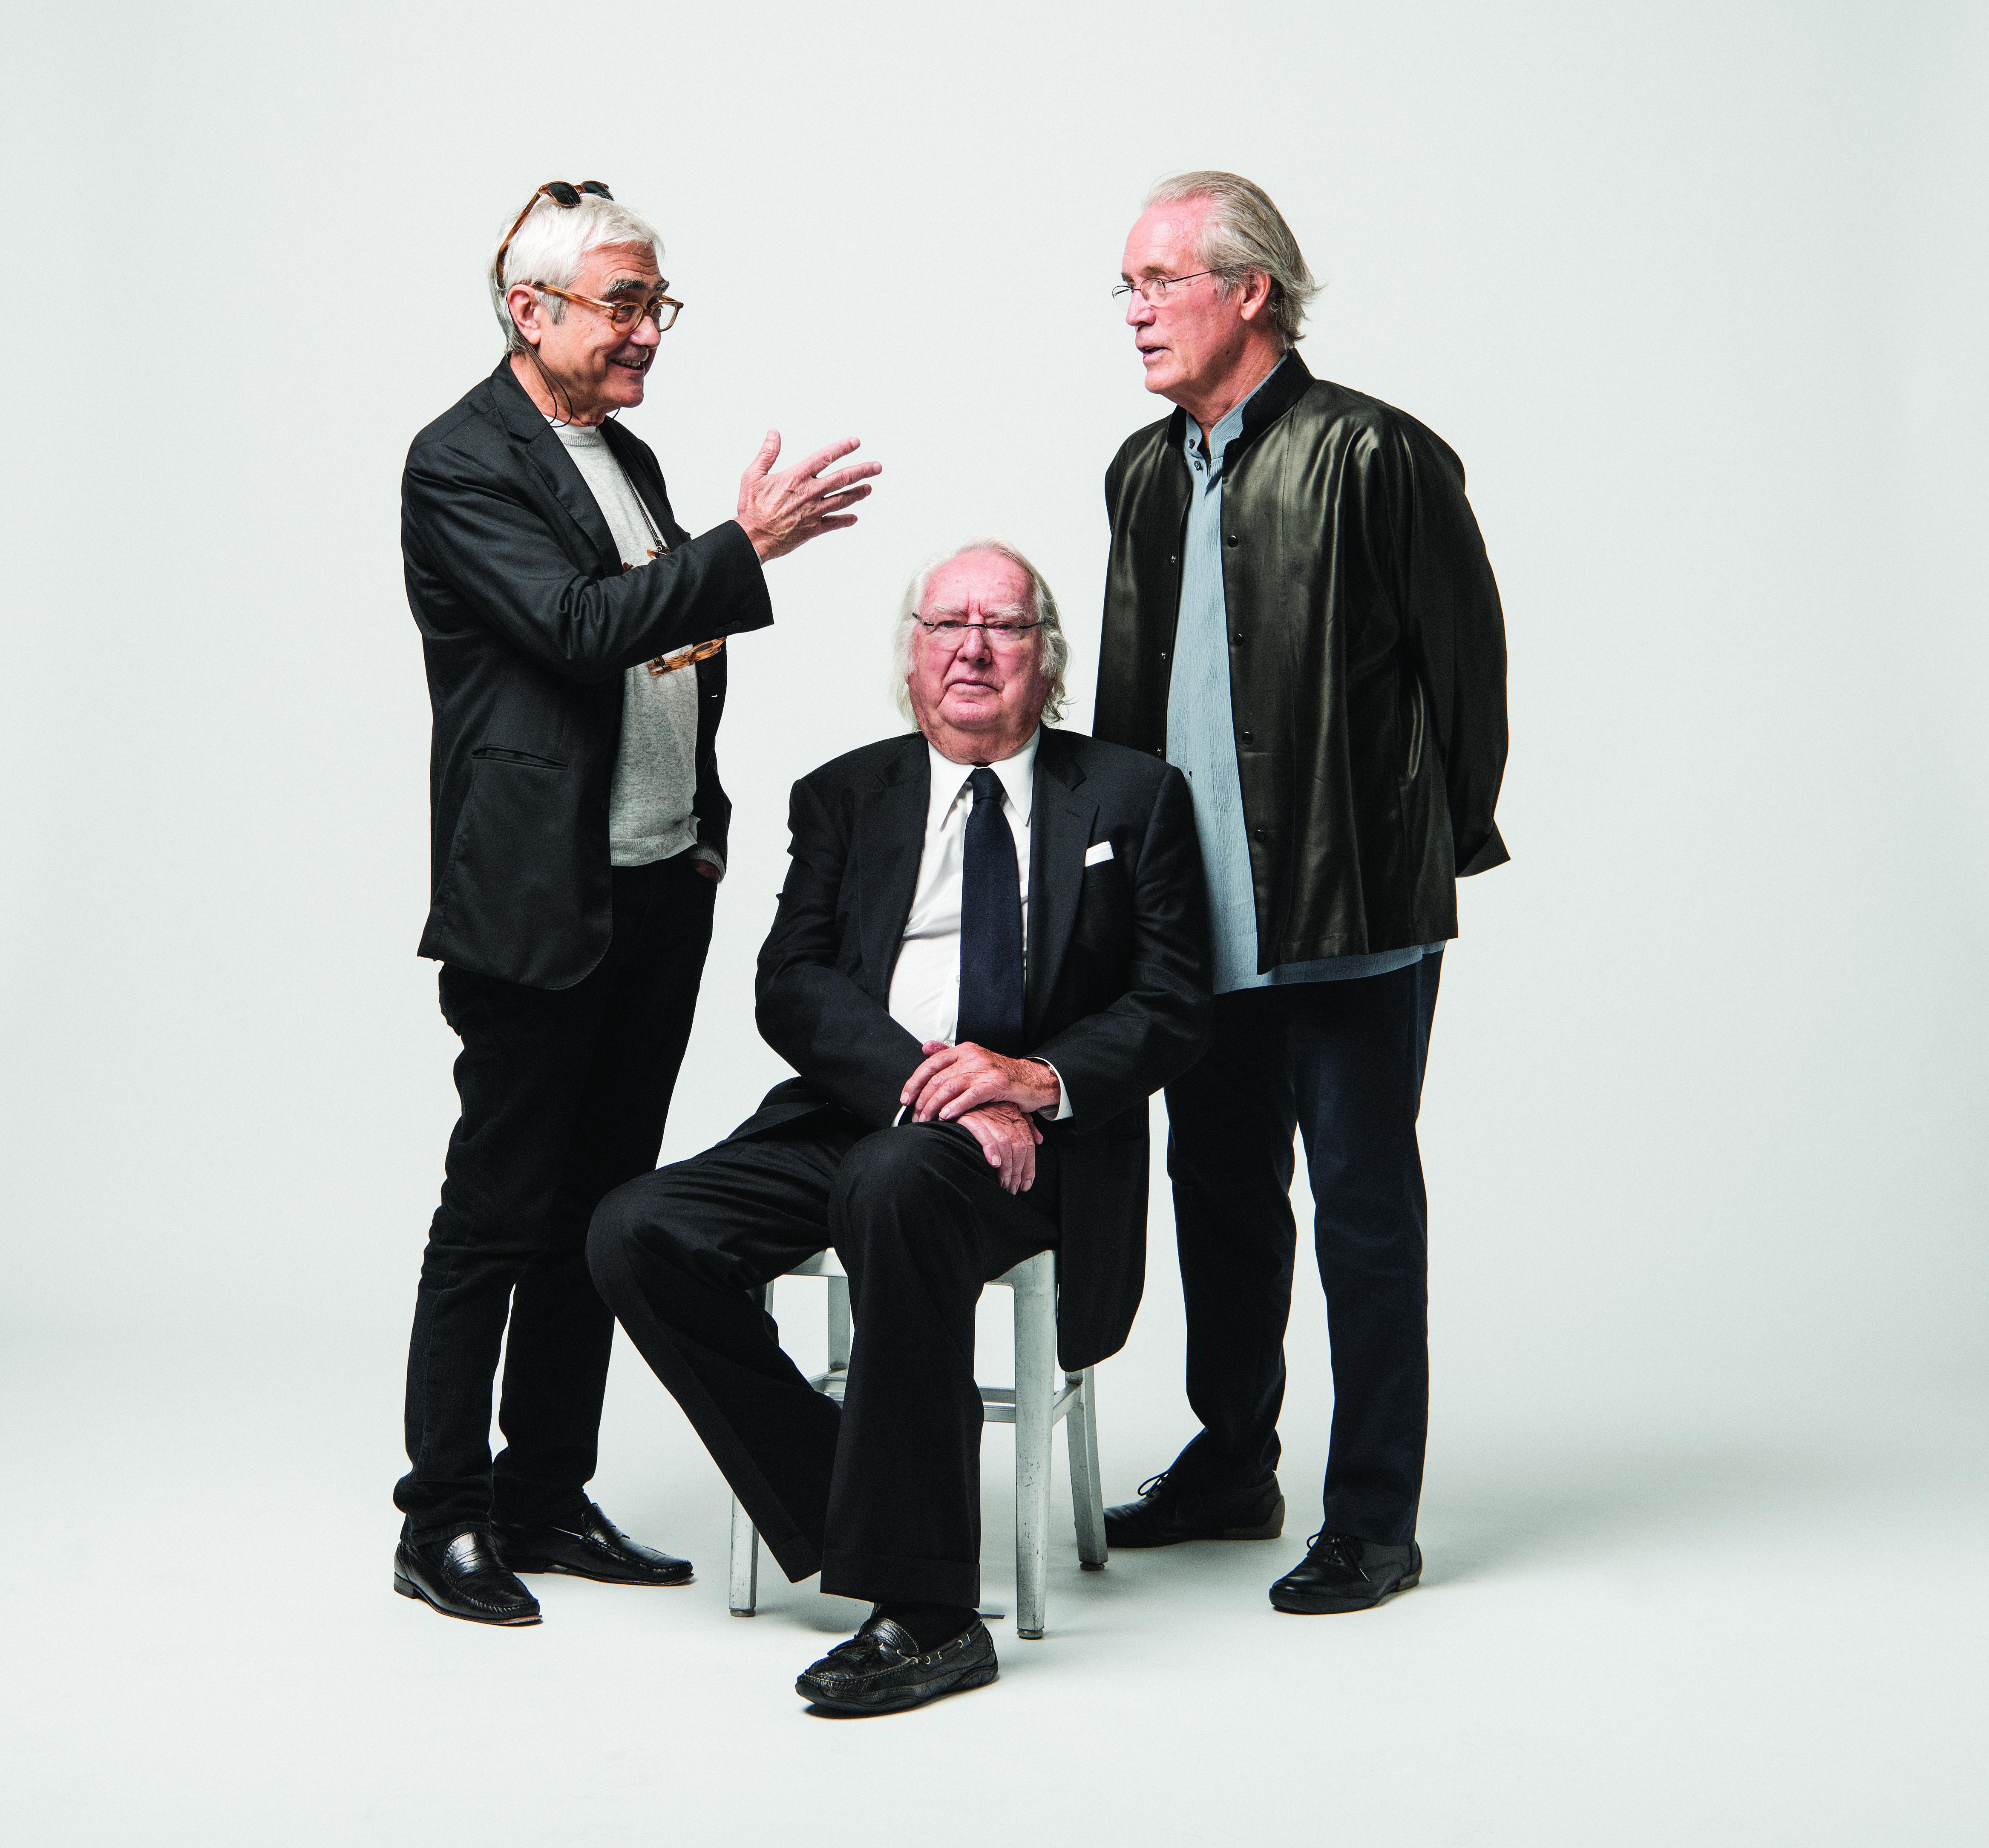 Starchitects Rafael Viñoly (left), Richard Meier (center) and William Pedersen are leading the design